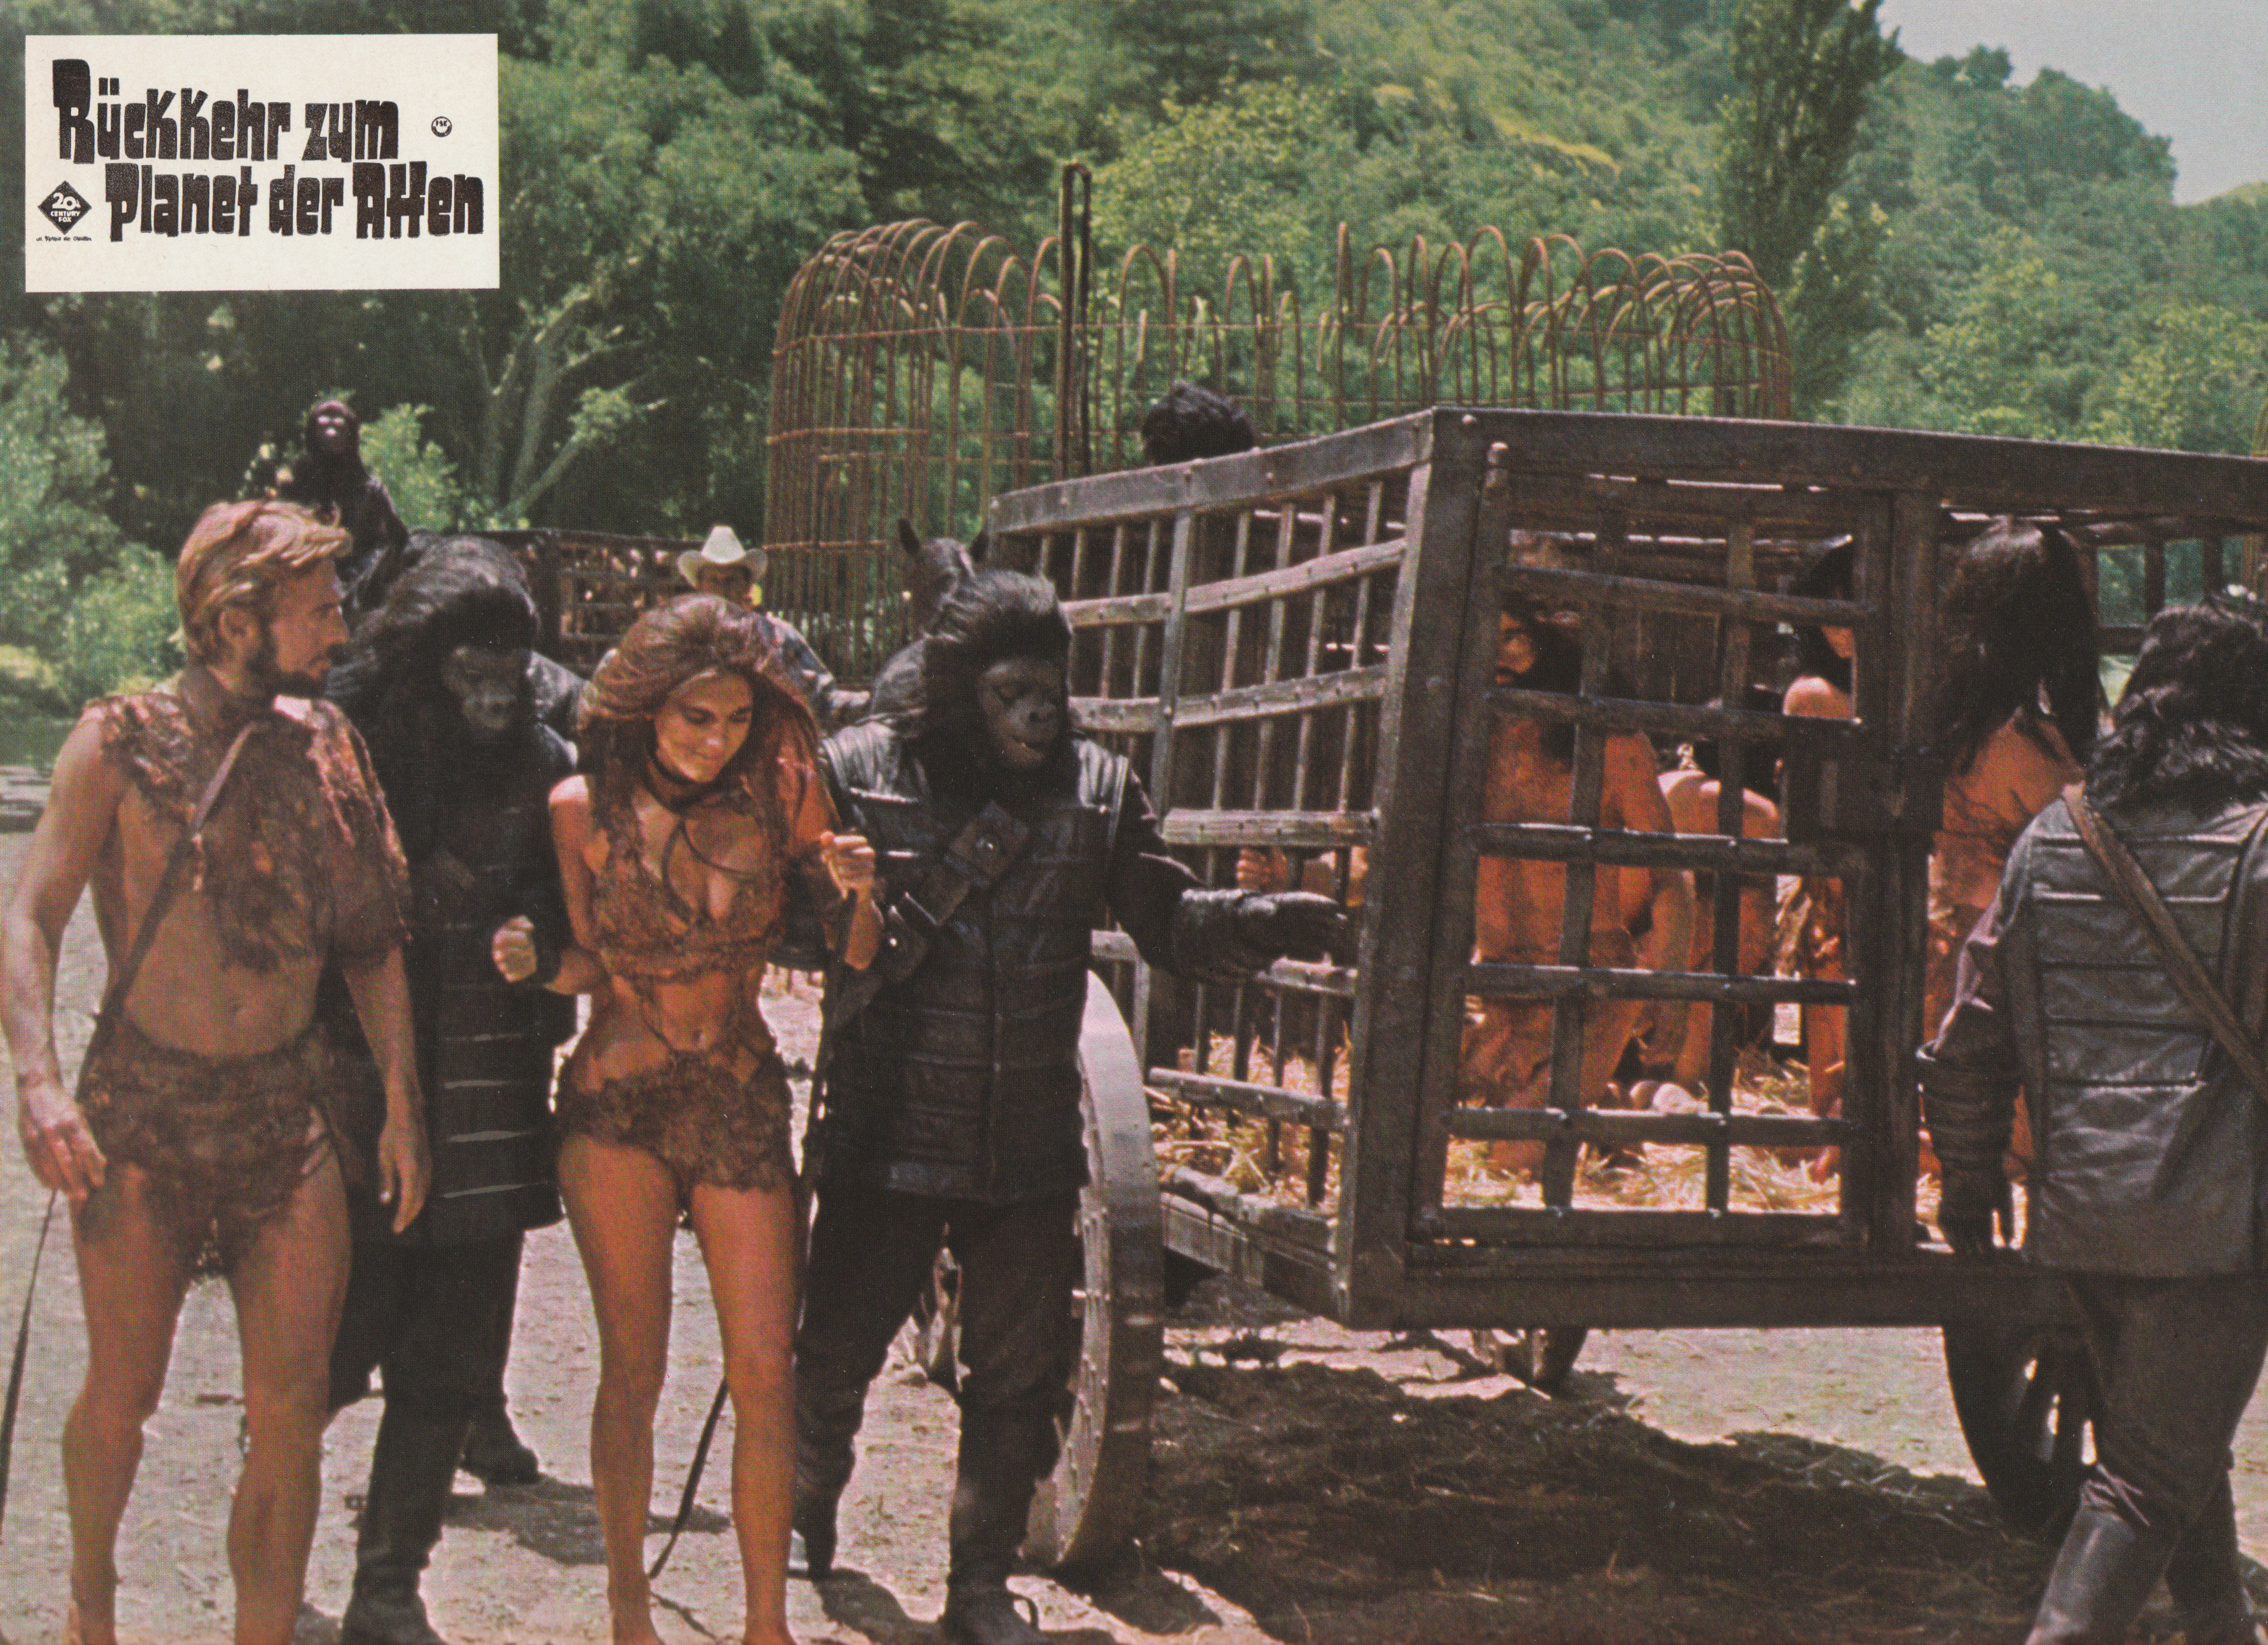 Pony the orangutan slave and the plight of primates